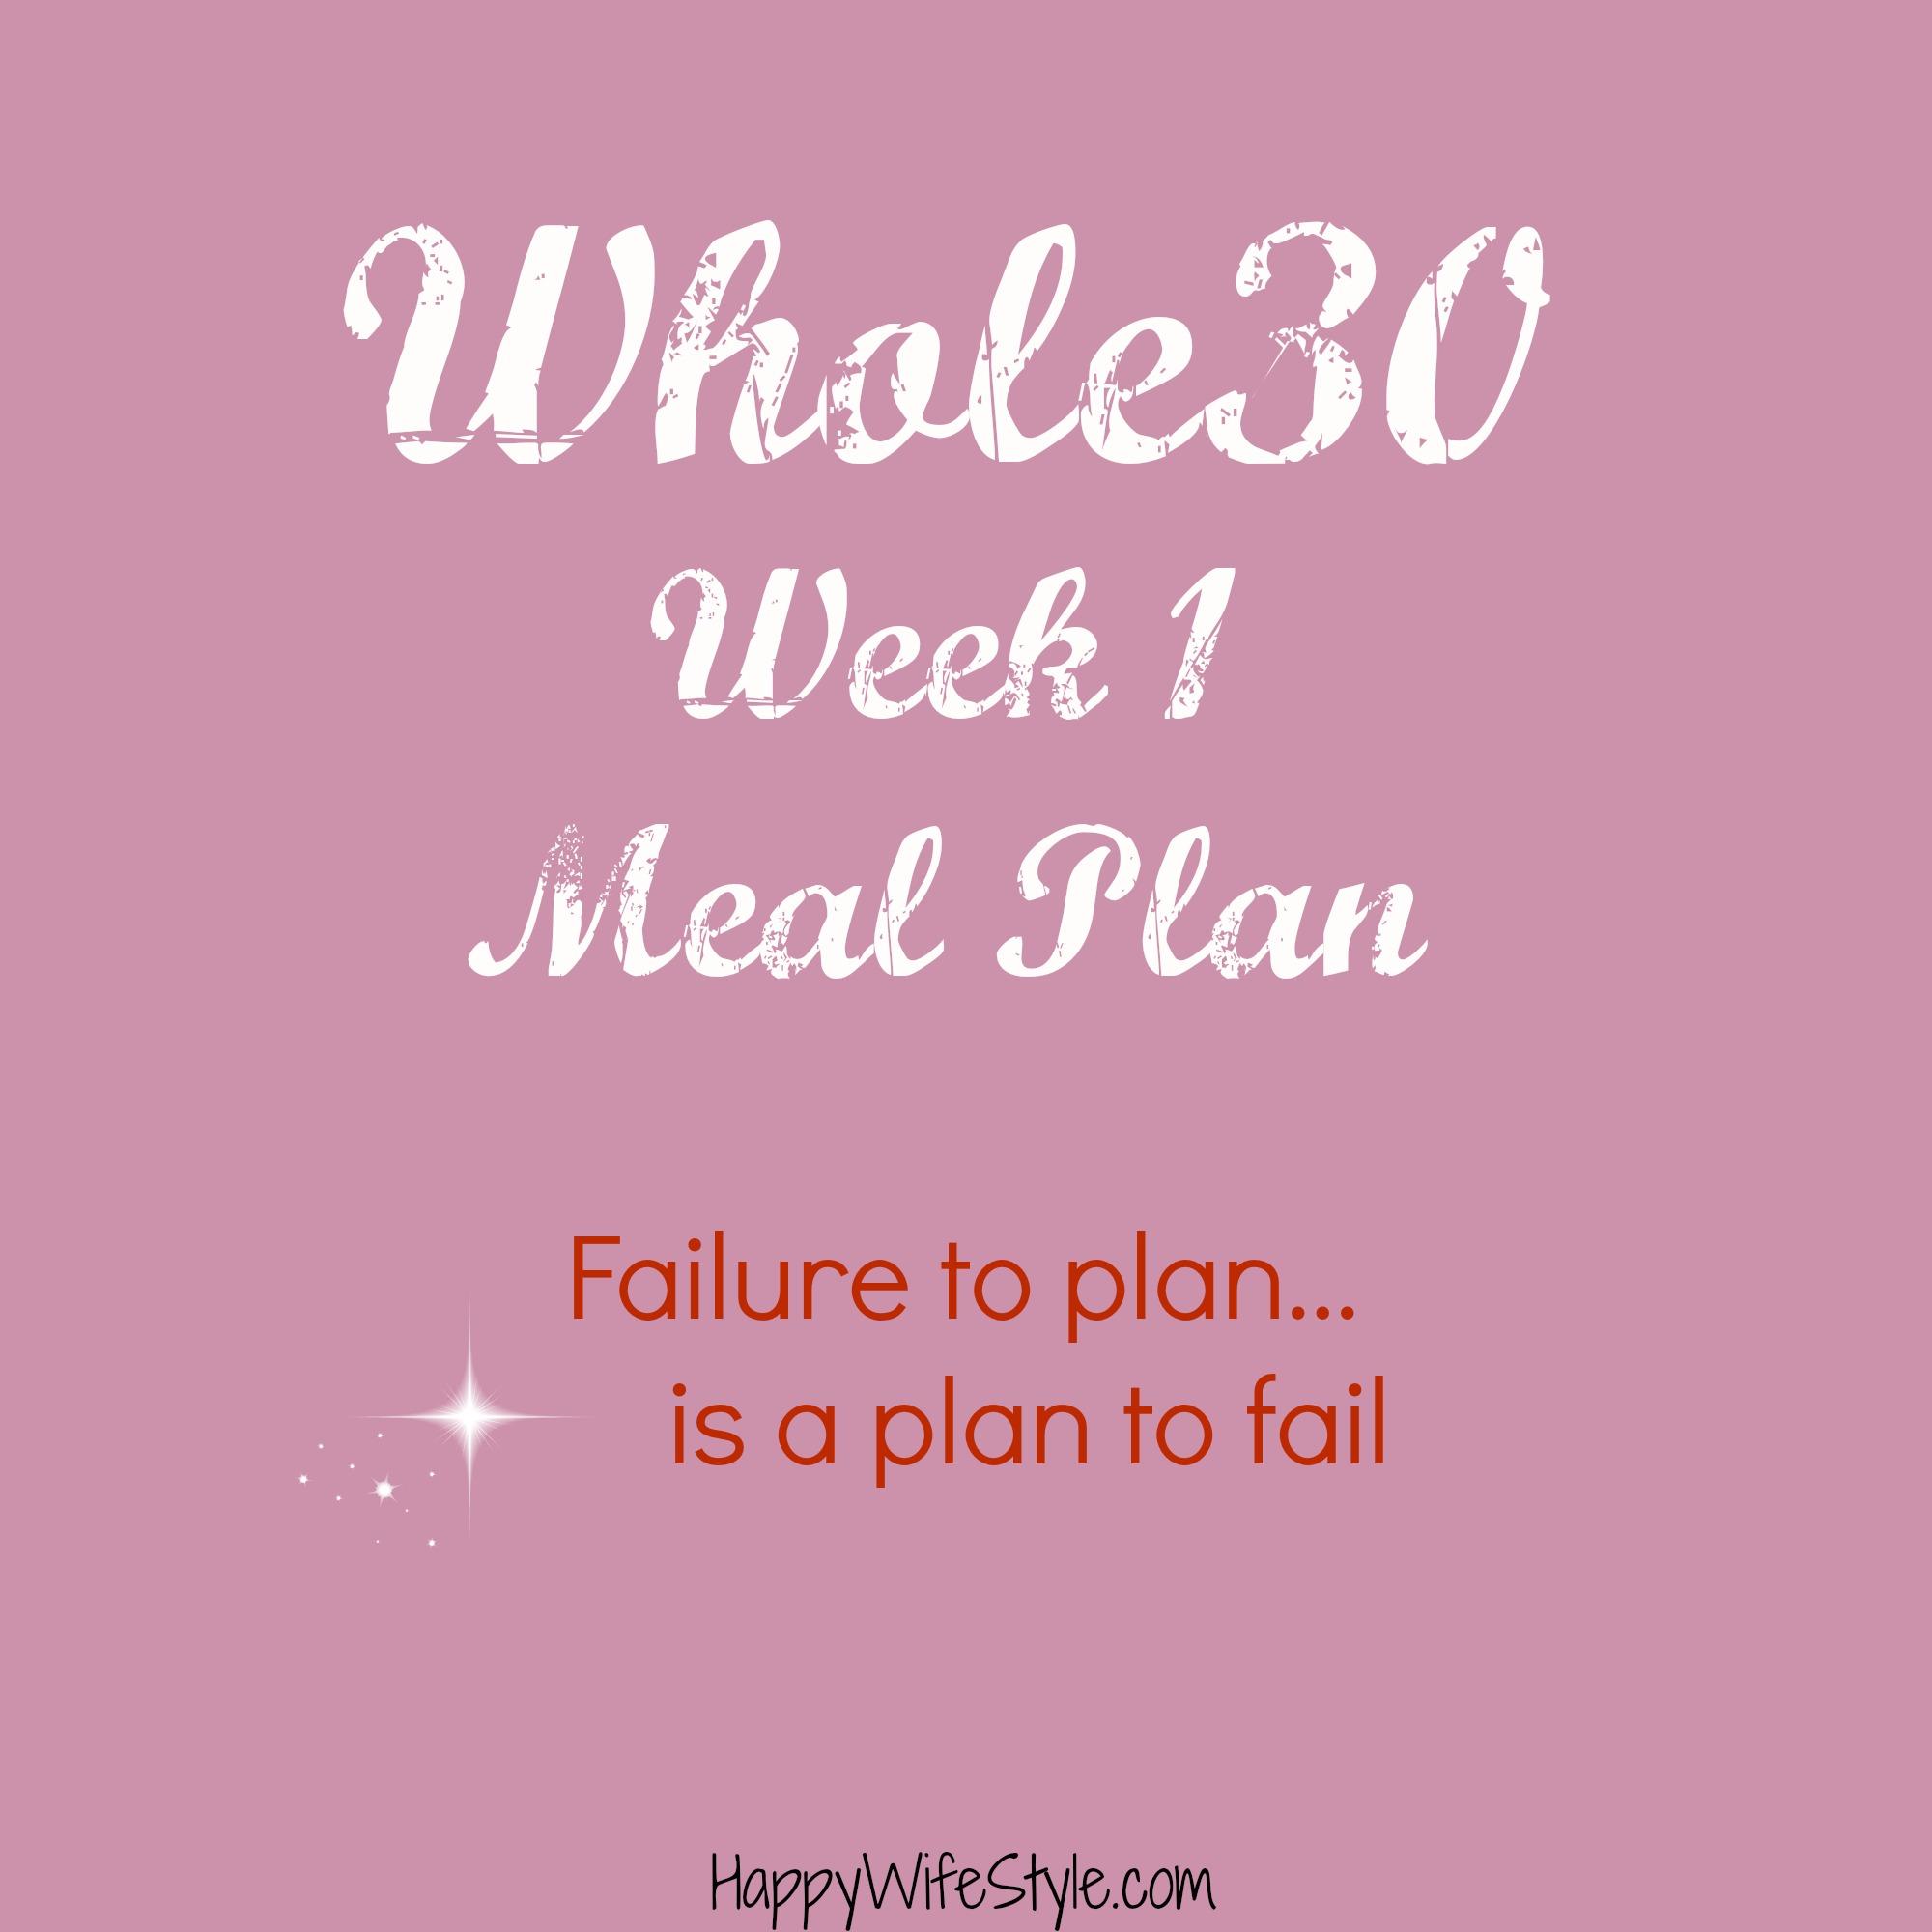 whole-30-week-1-meal-plan